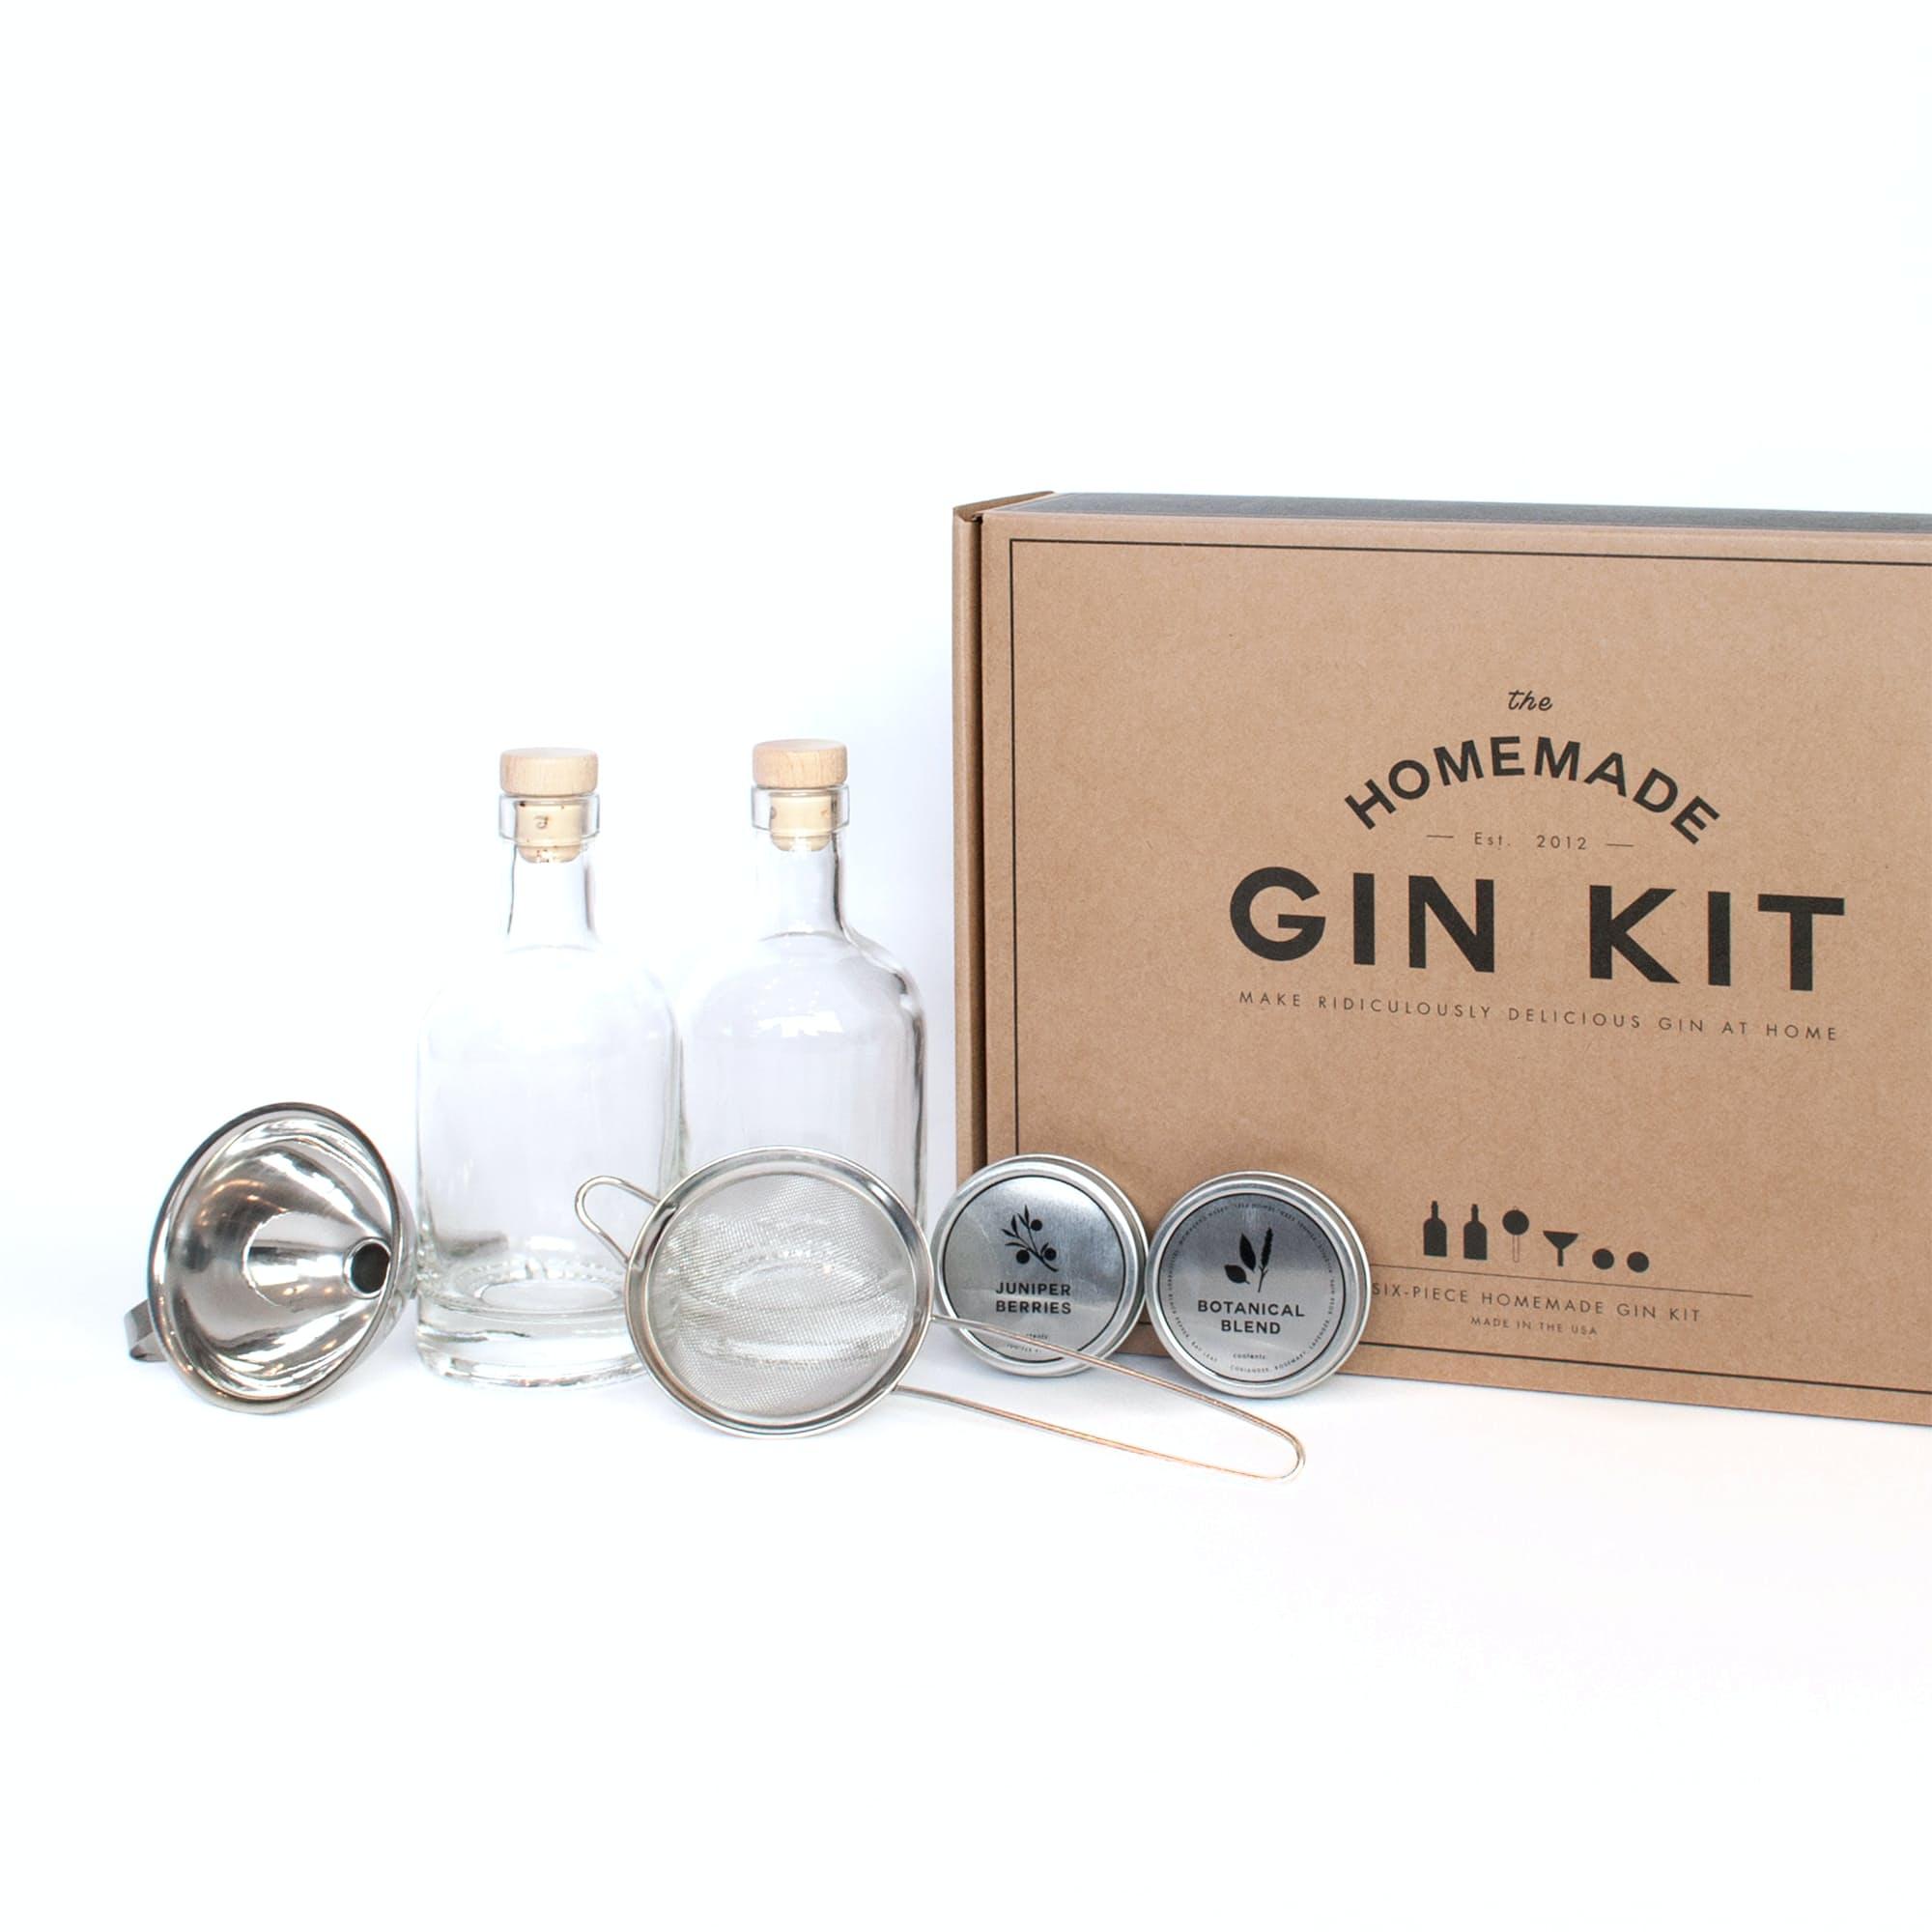 Xaycecbypf w p design homemade gin kit 0 original